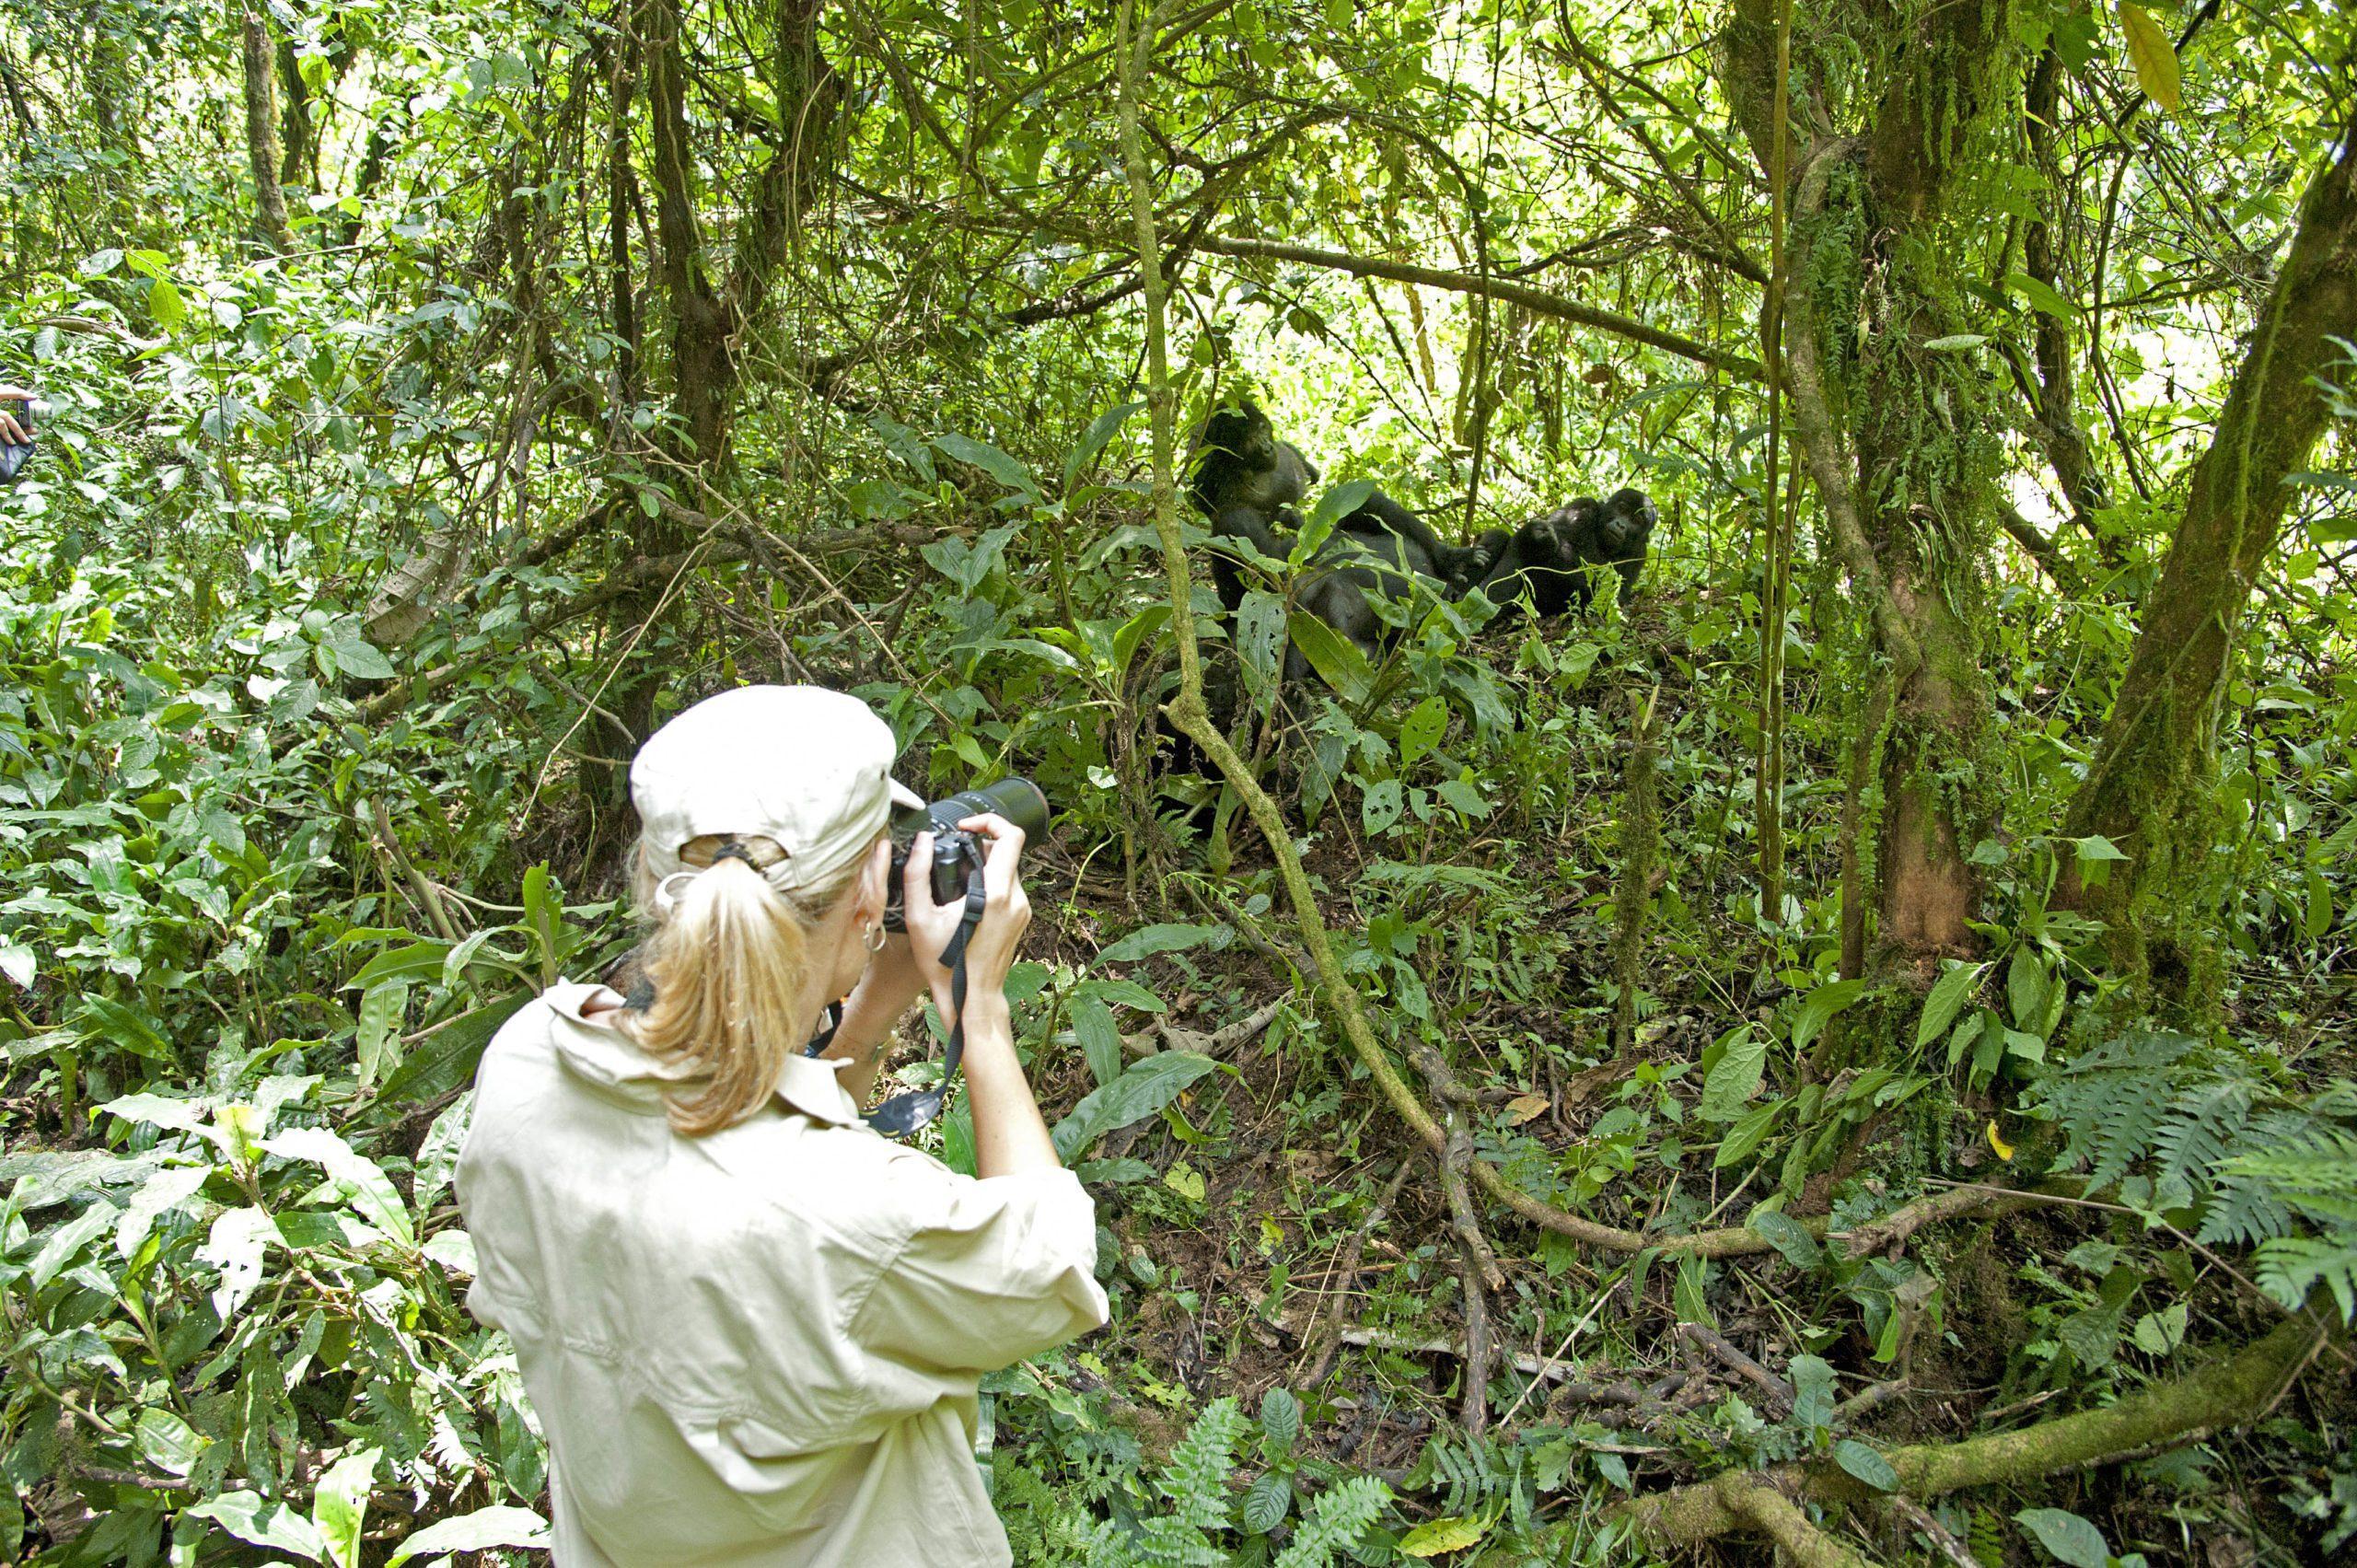 Gorilla Trekking Bwindi Impenetrable Forrest on Uganda safari